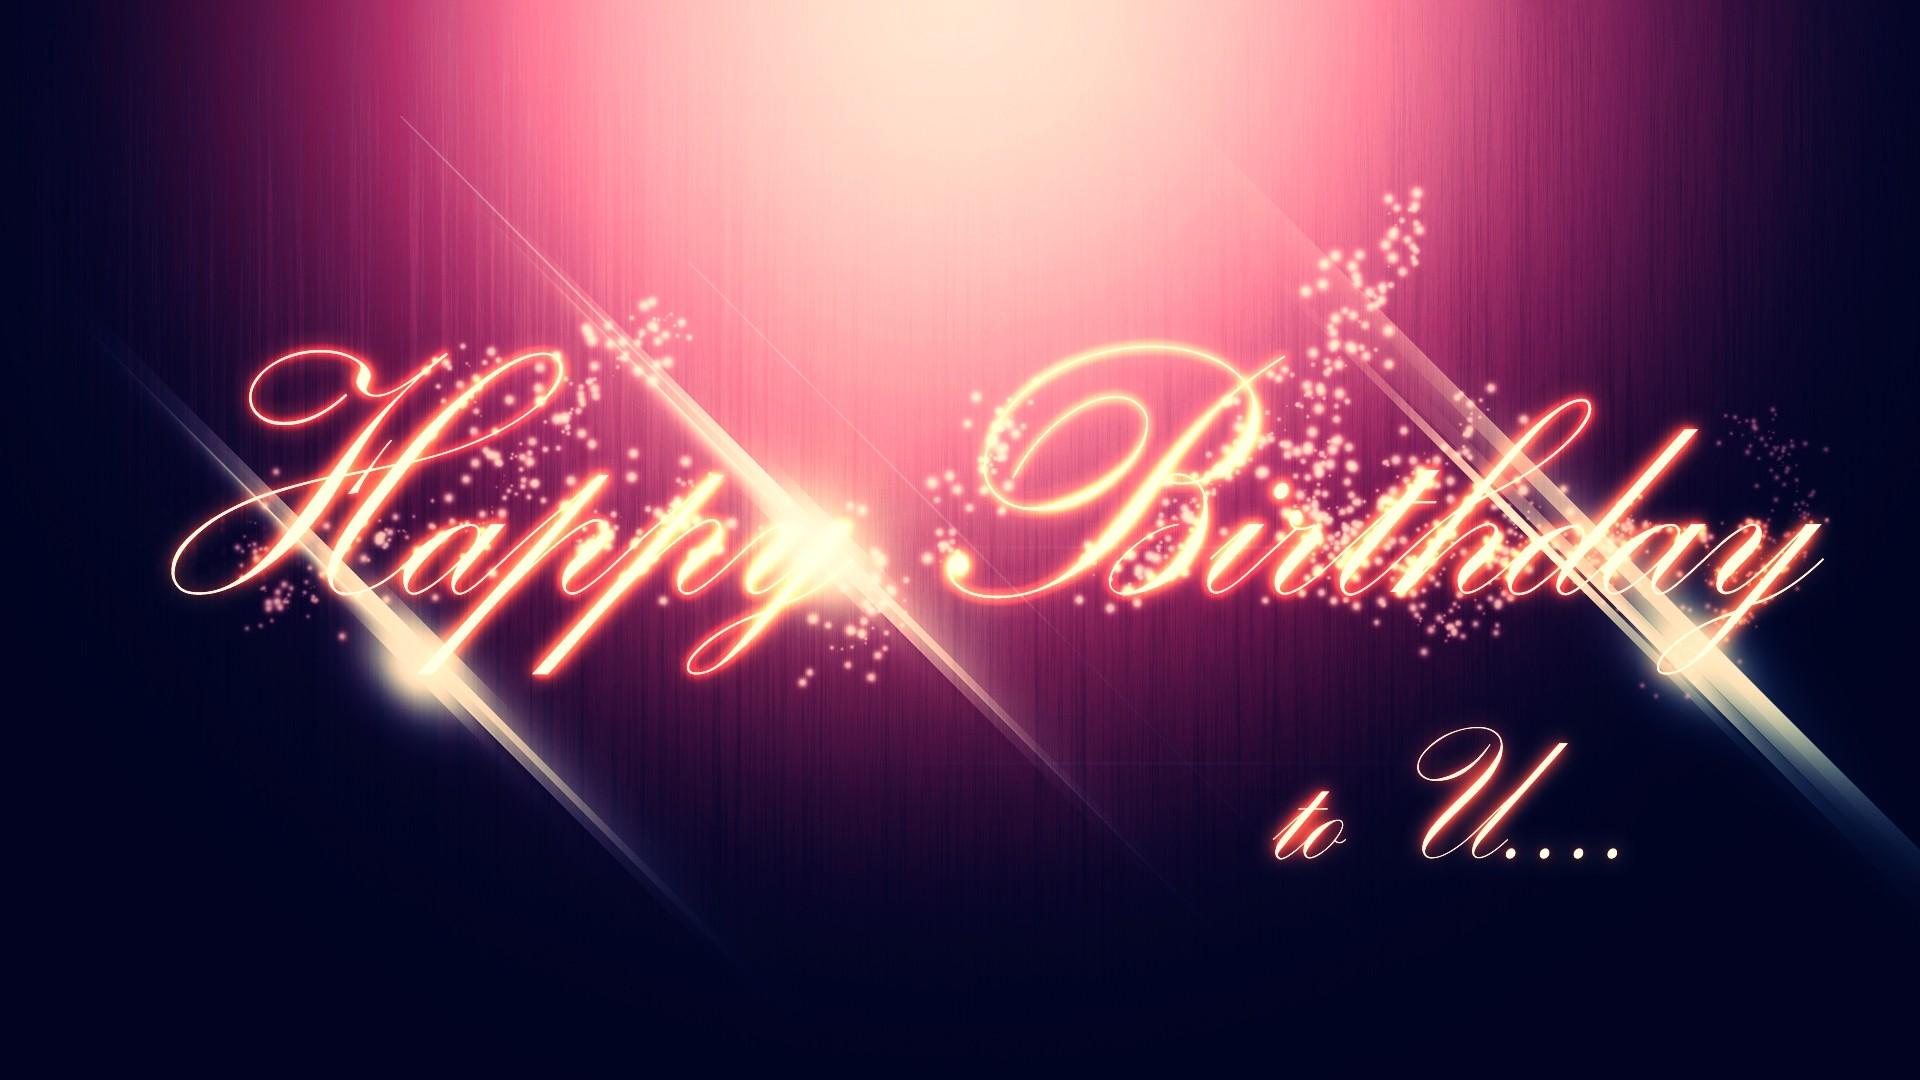 happy-birthday-wishes-desktop-wallpaper.jpg